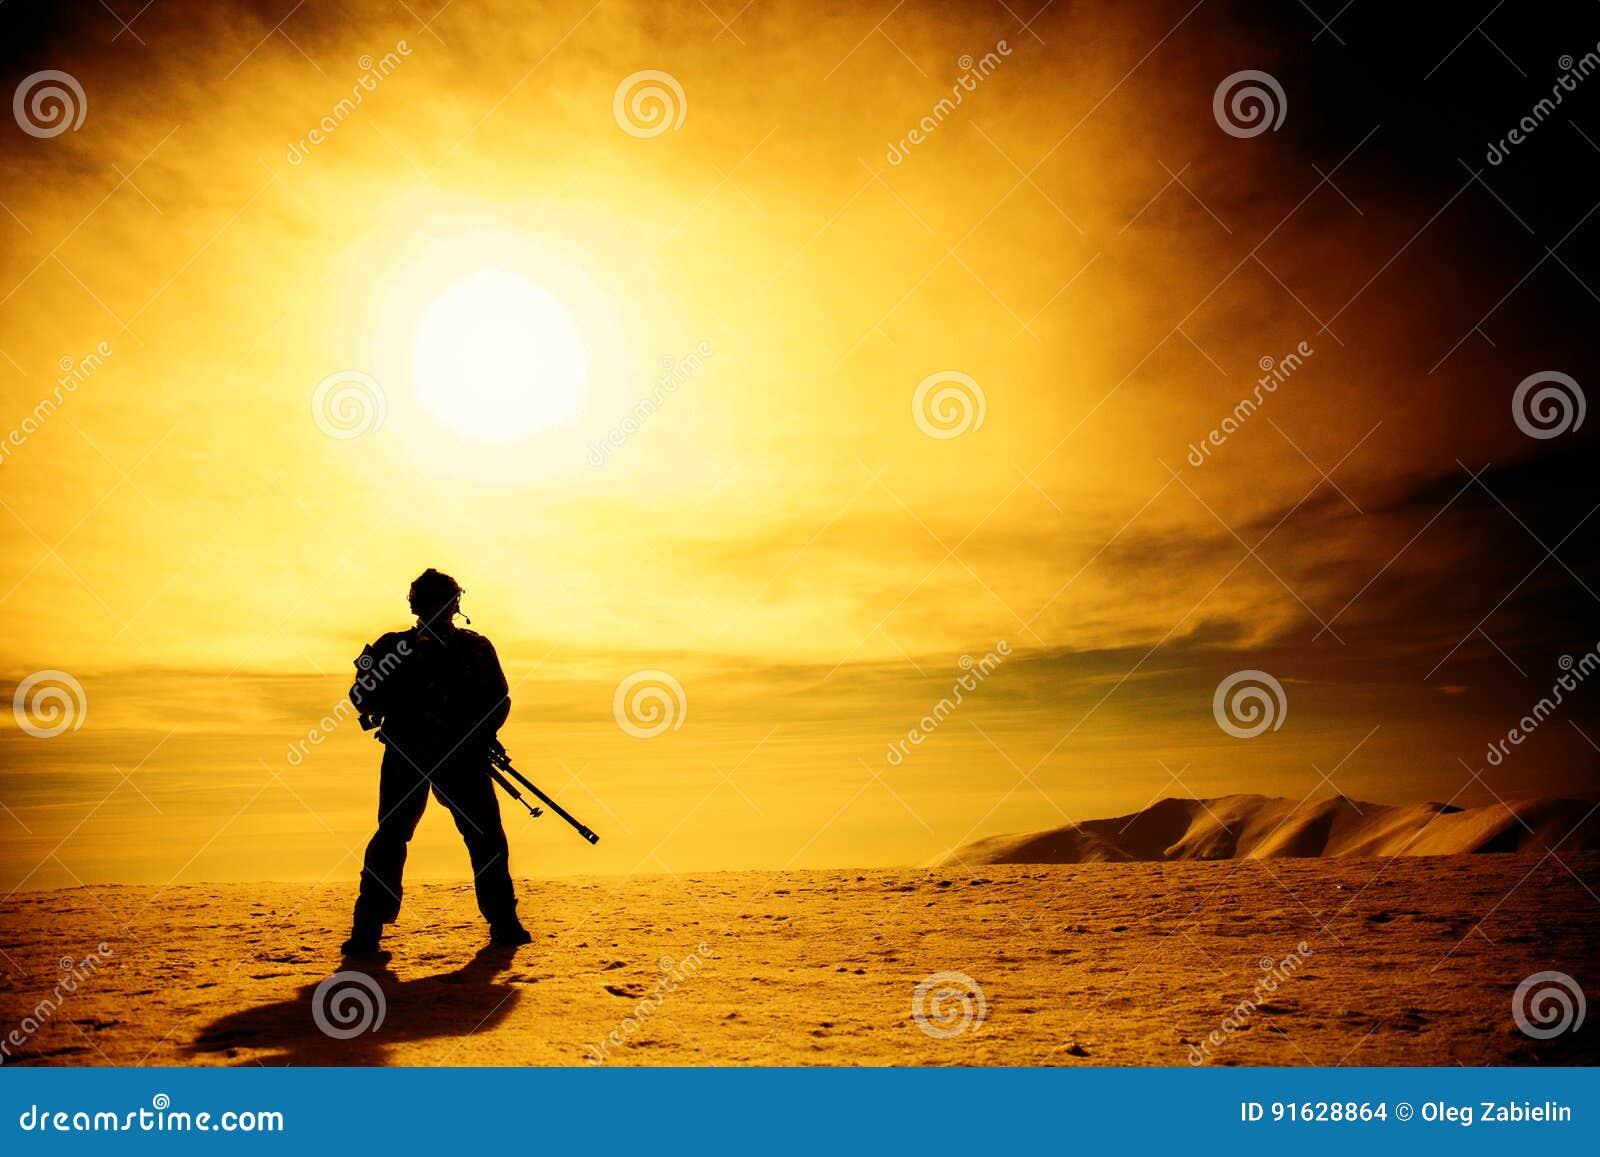 Silhouet van militair met sluipschuttergeweer